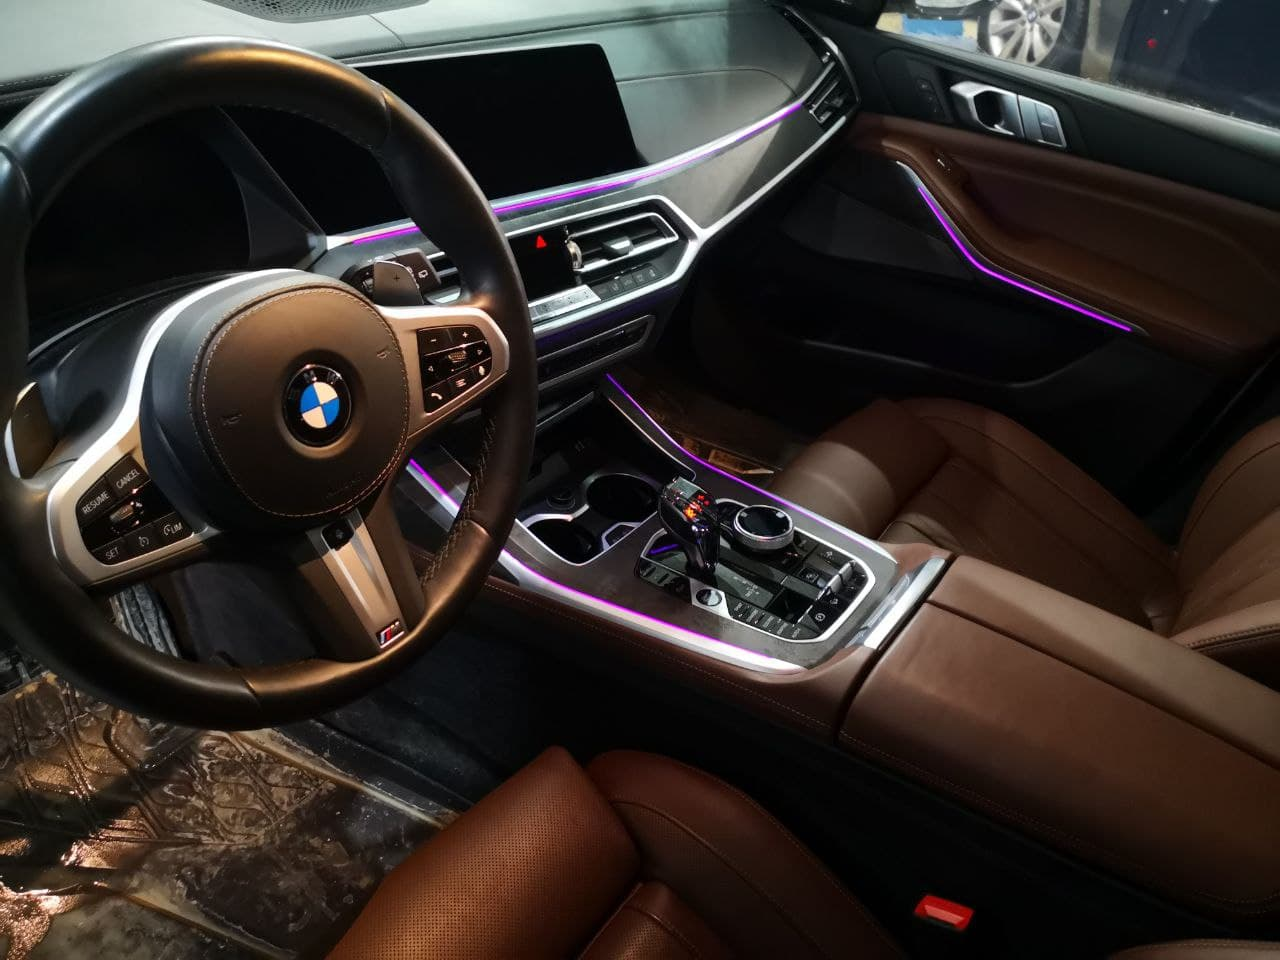 салон BMW X7 G07, хрустальный селектор